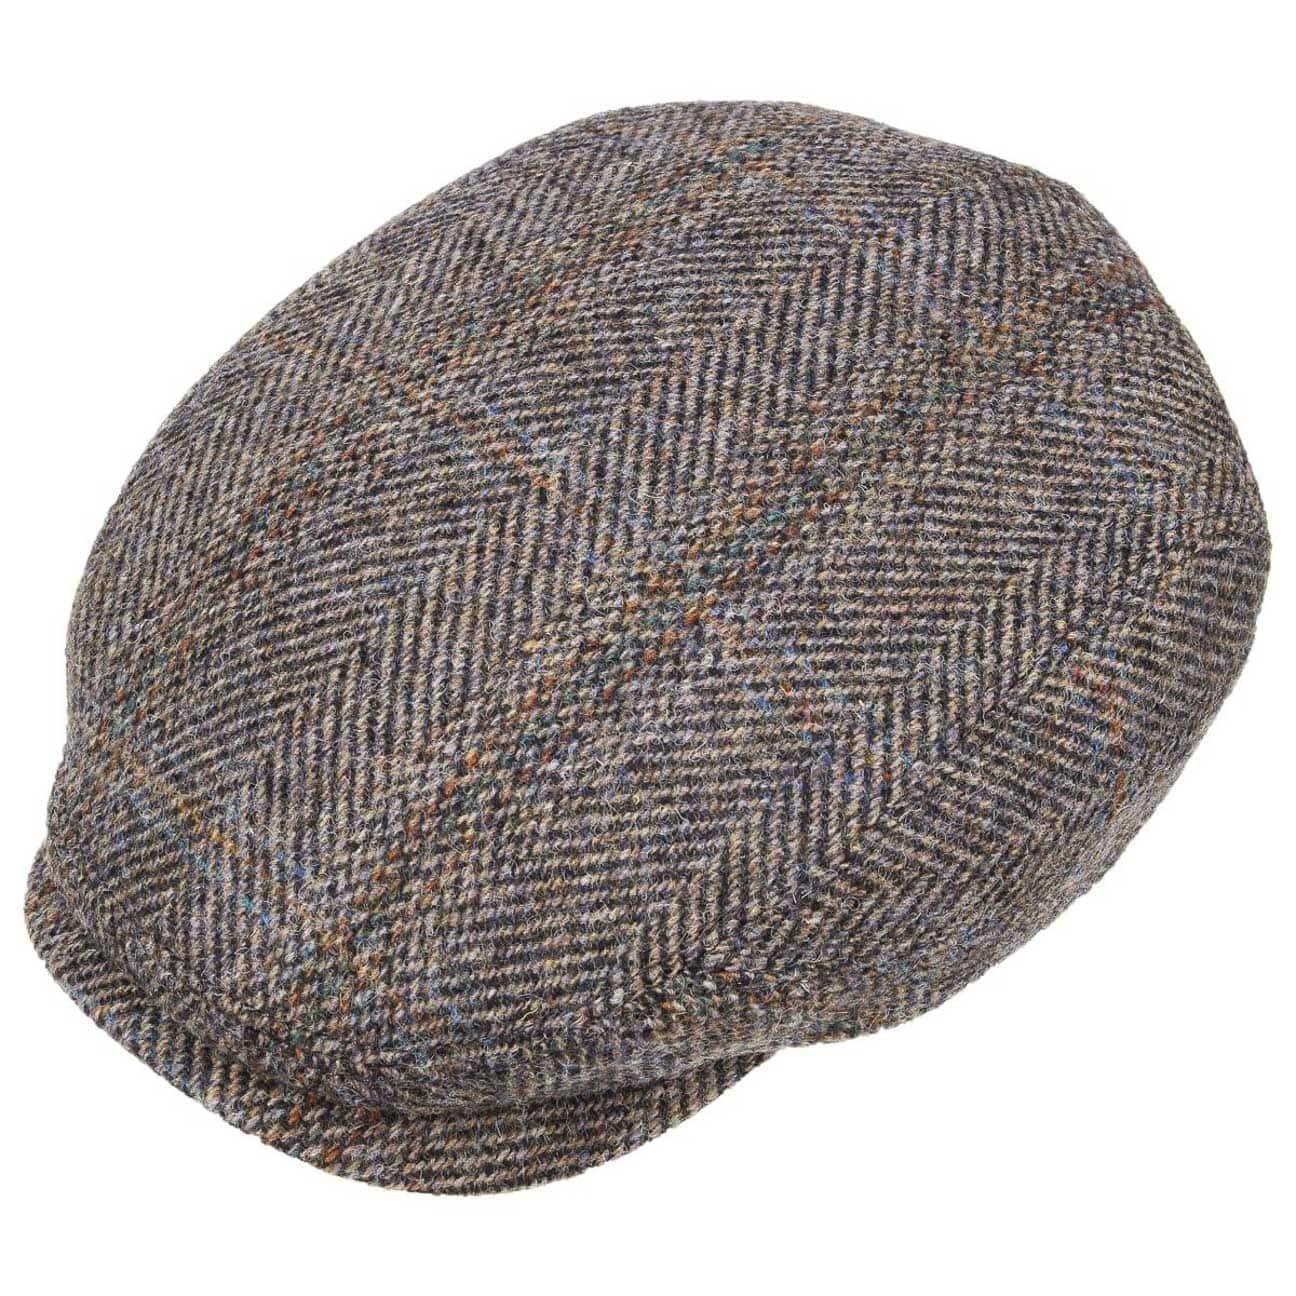 pretty cheap stable quality popular brand Belfast Harris Tweed Flat Cap by Stetson